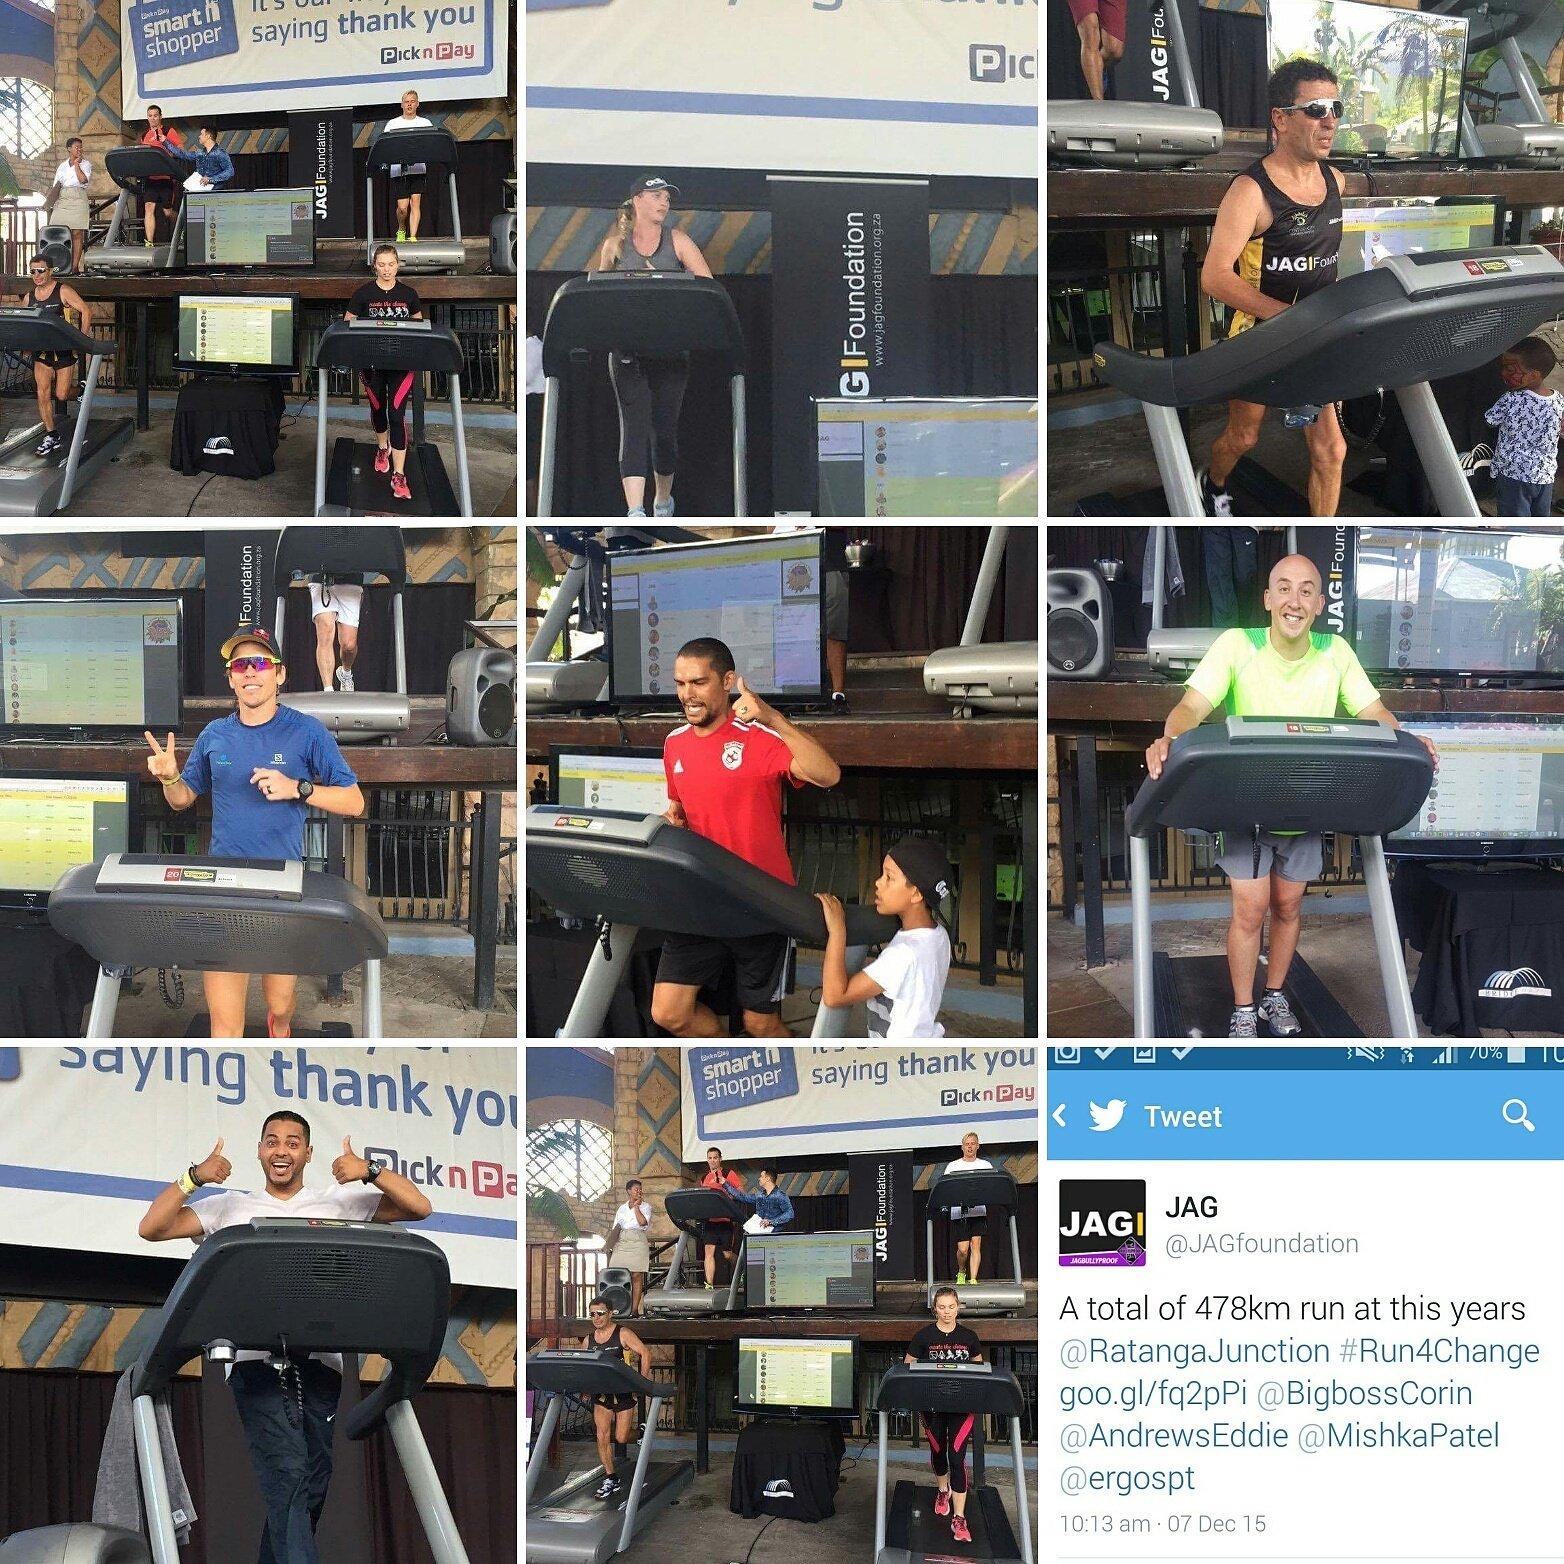 @JAGfoundation #Run4Change https://t.co/sHz7LZa9km